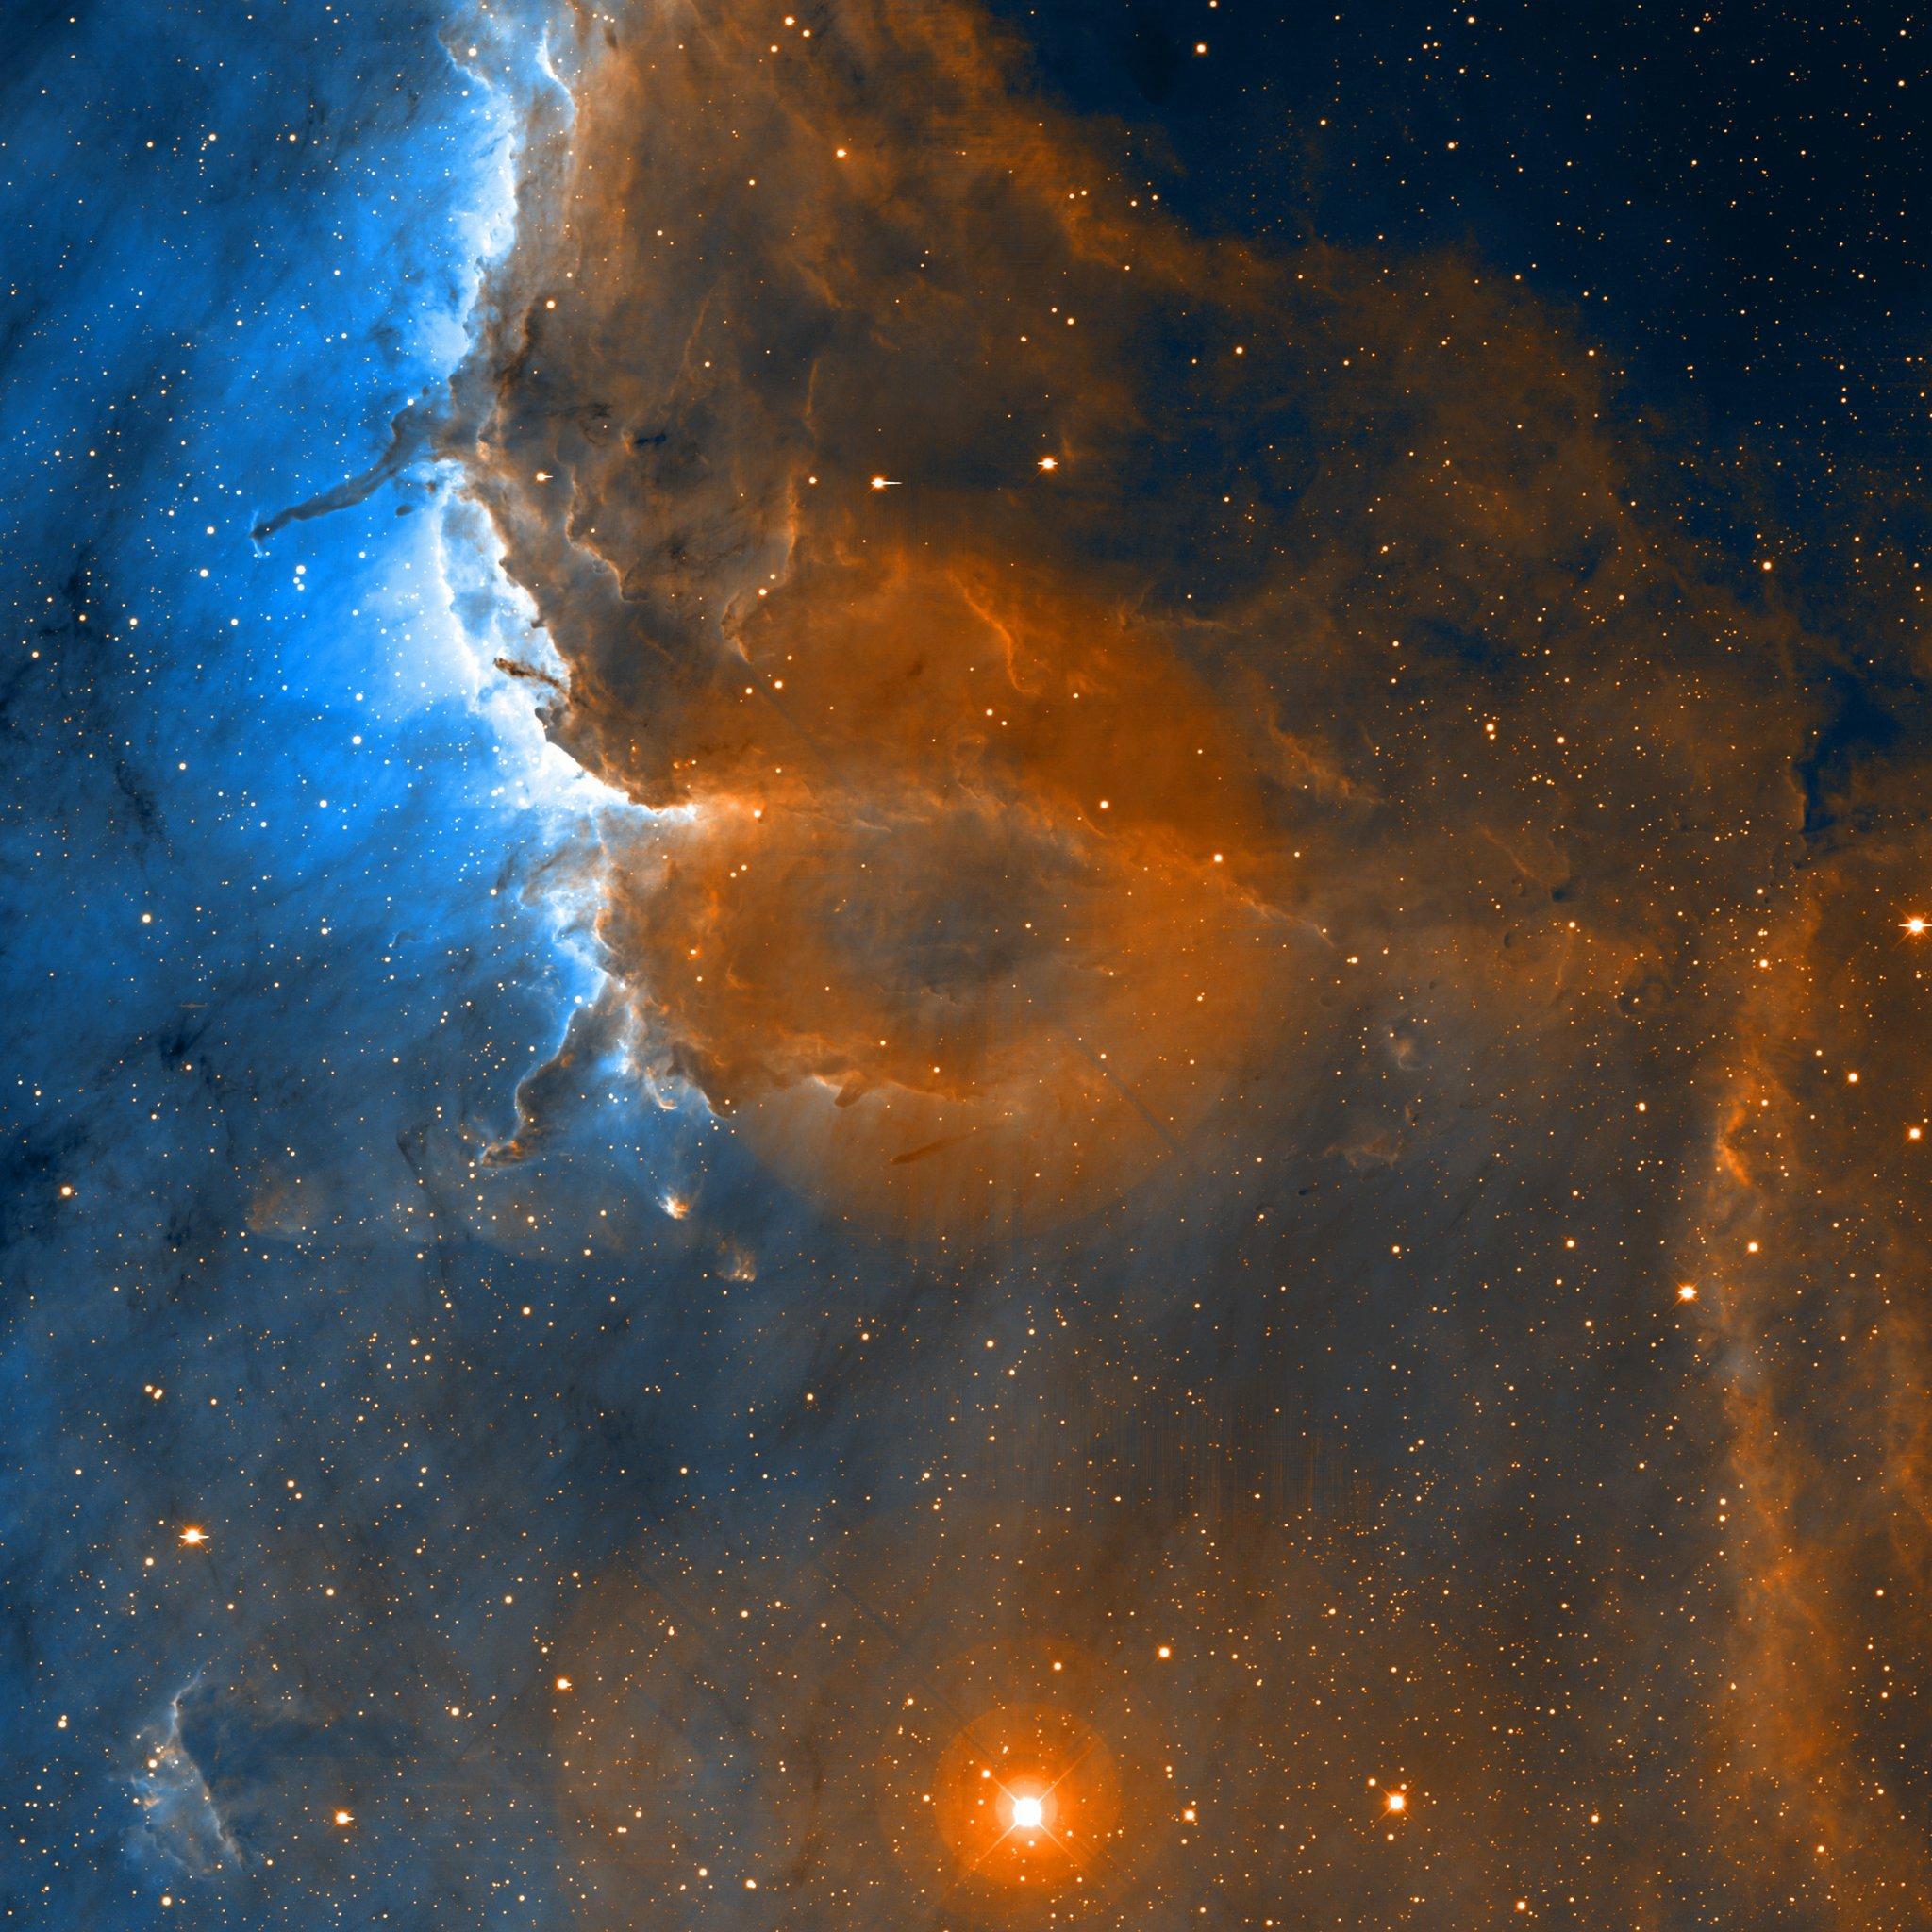 ipad-retina-3-wallpaper-deep-space-08-2048x2048.